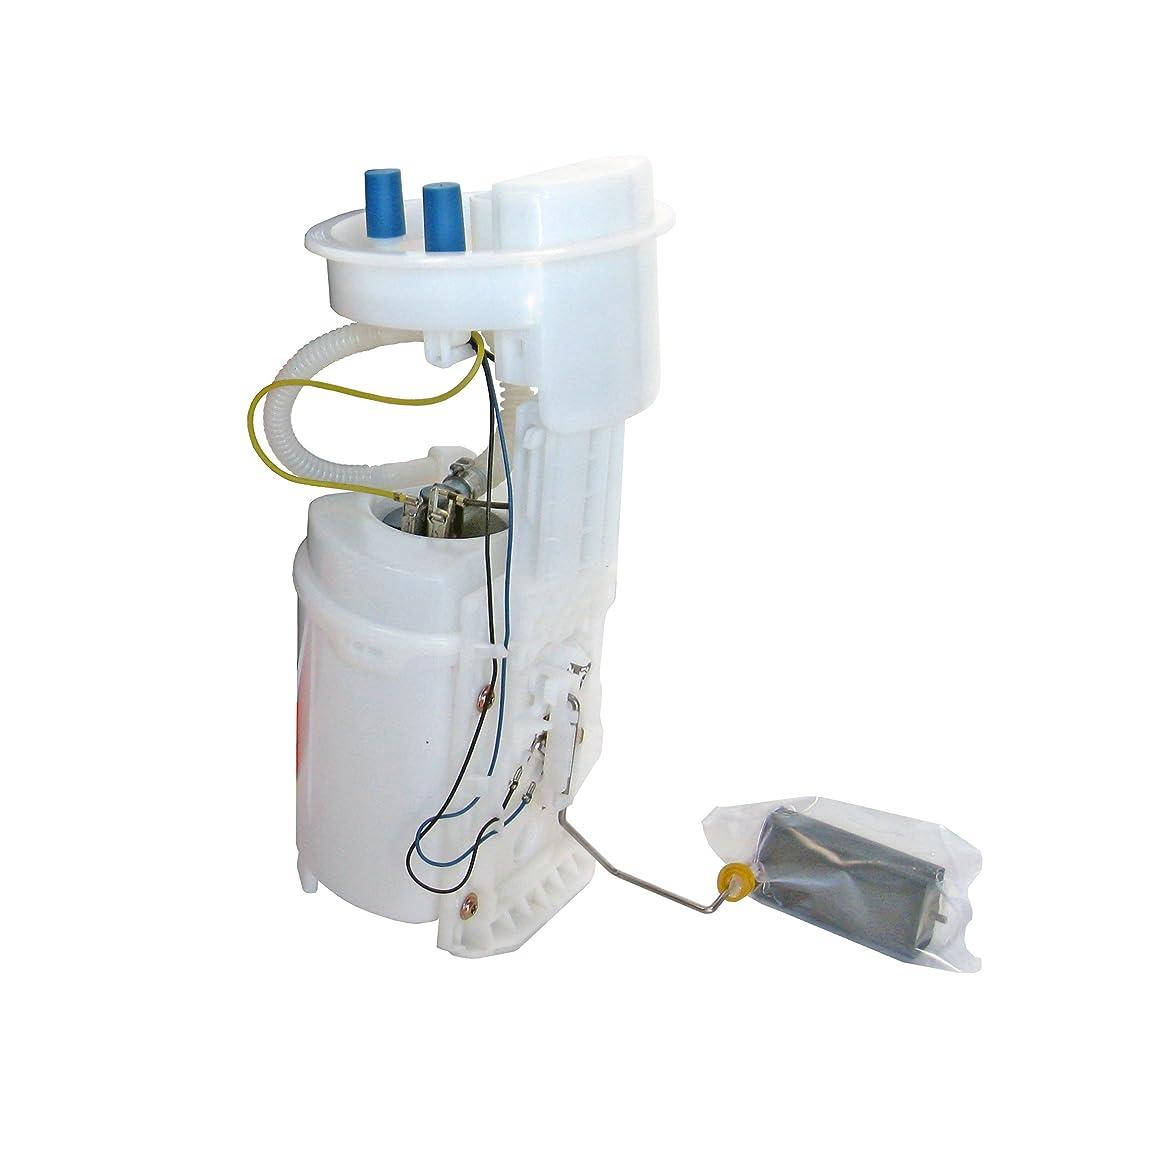 Autobest F4435A Fuel Pump Module Assembly